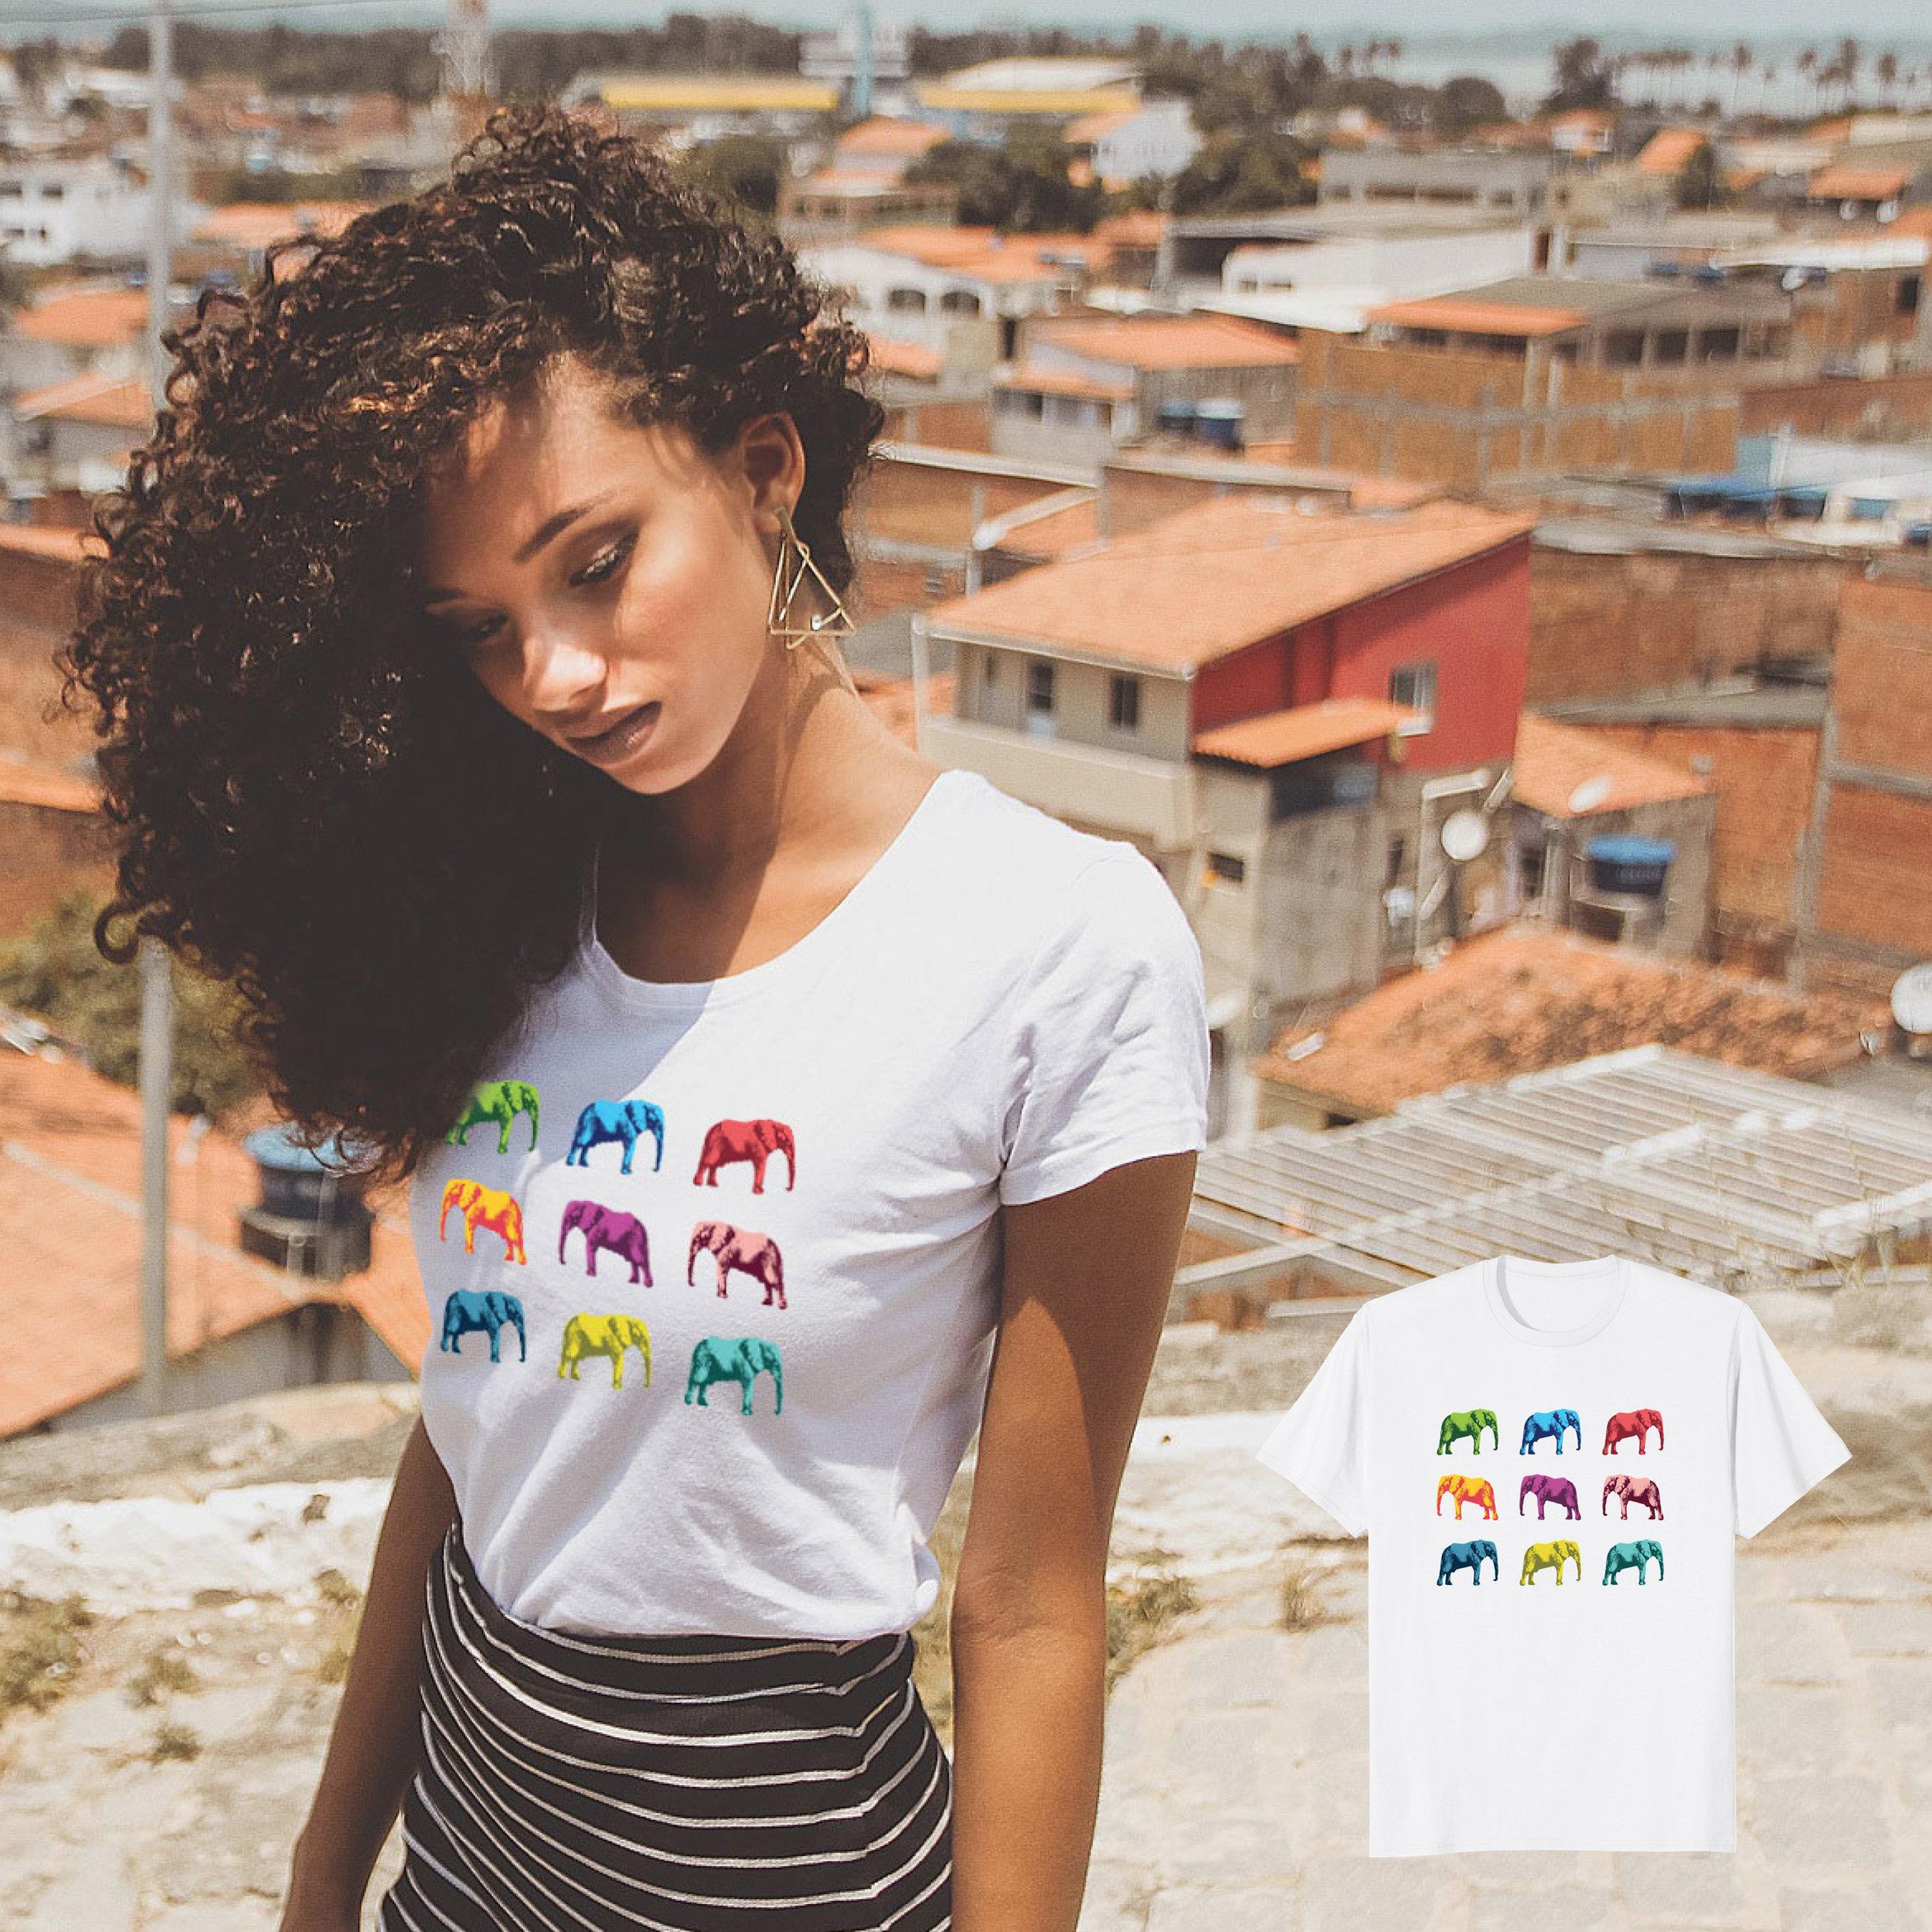 _  CUSTOM DESIGNed T-SHIRTS  apparel